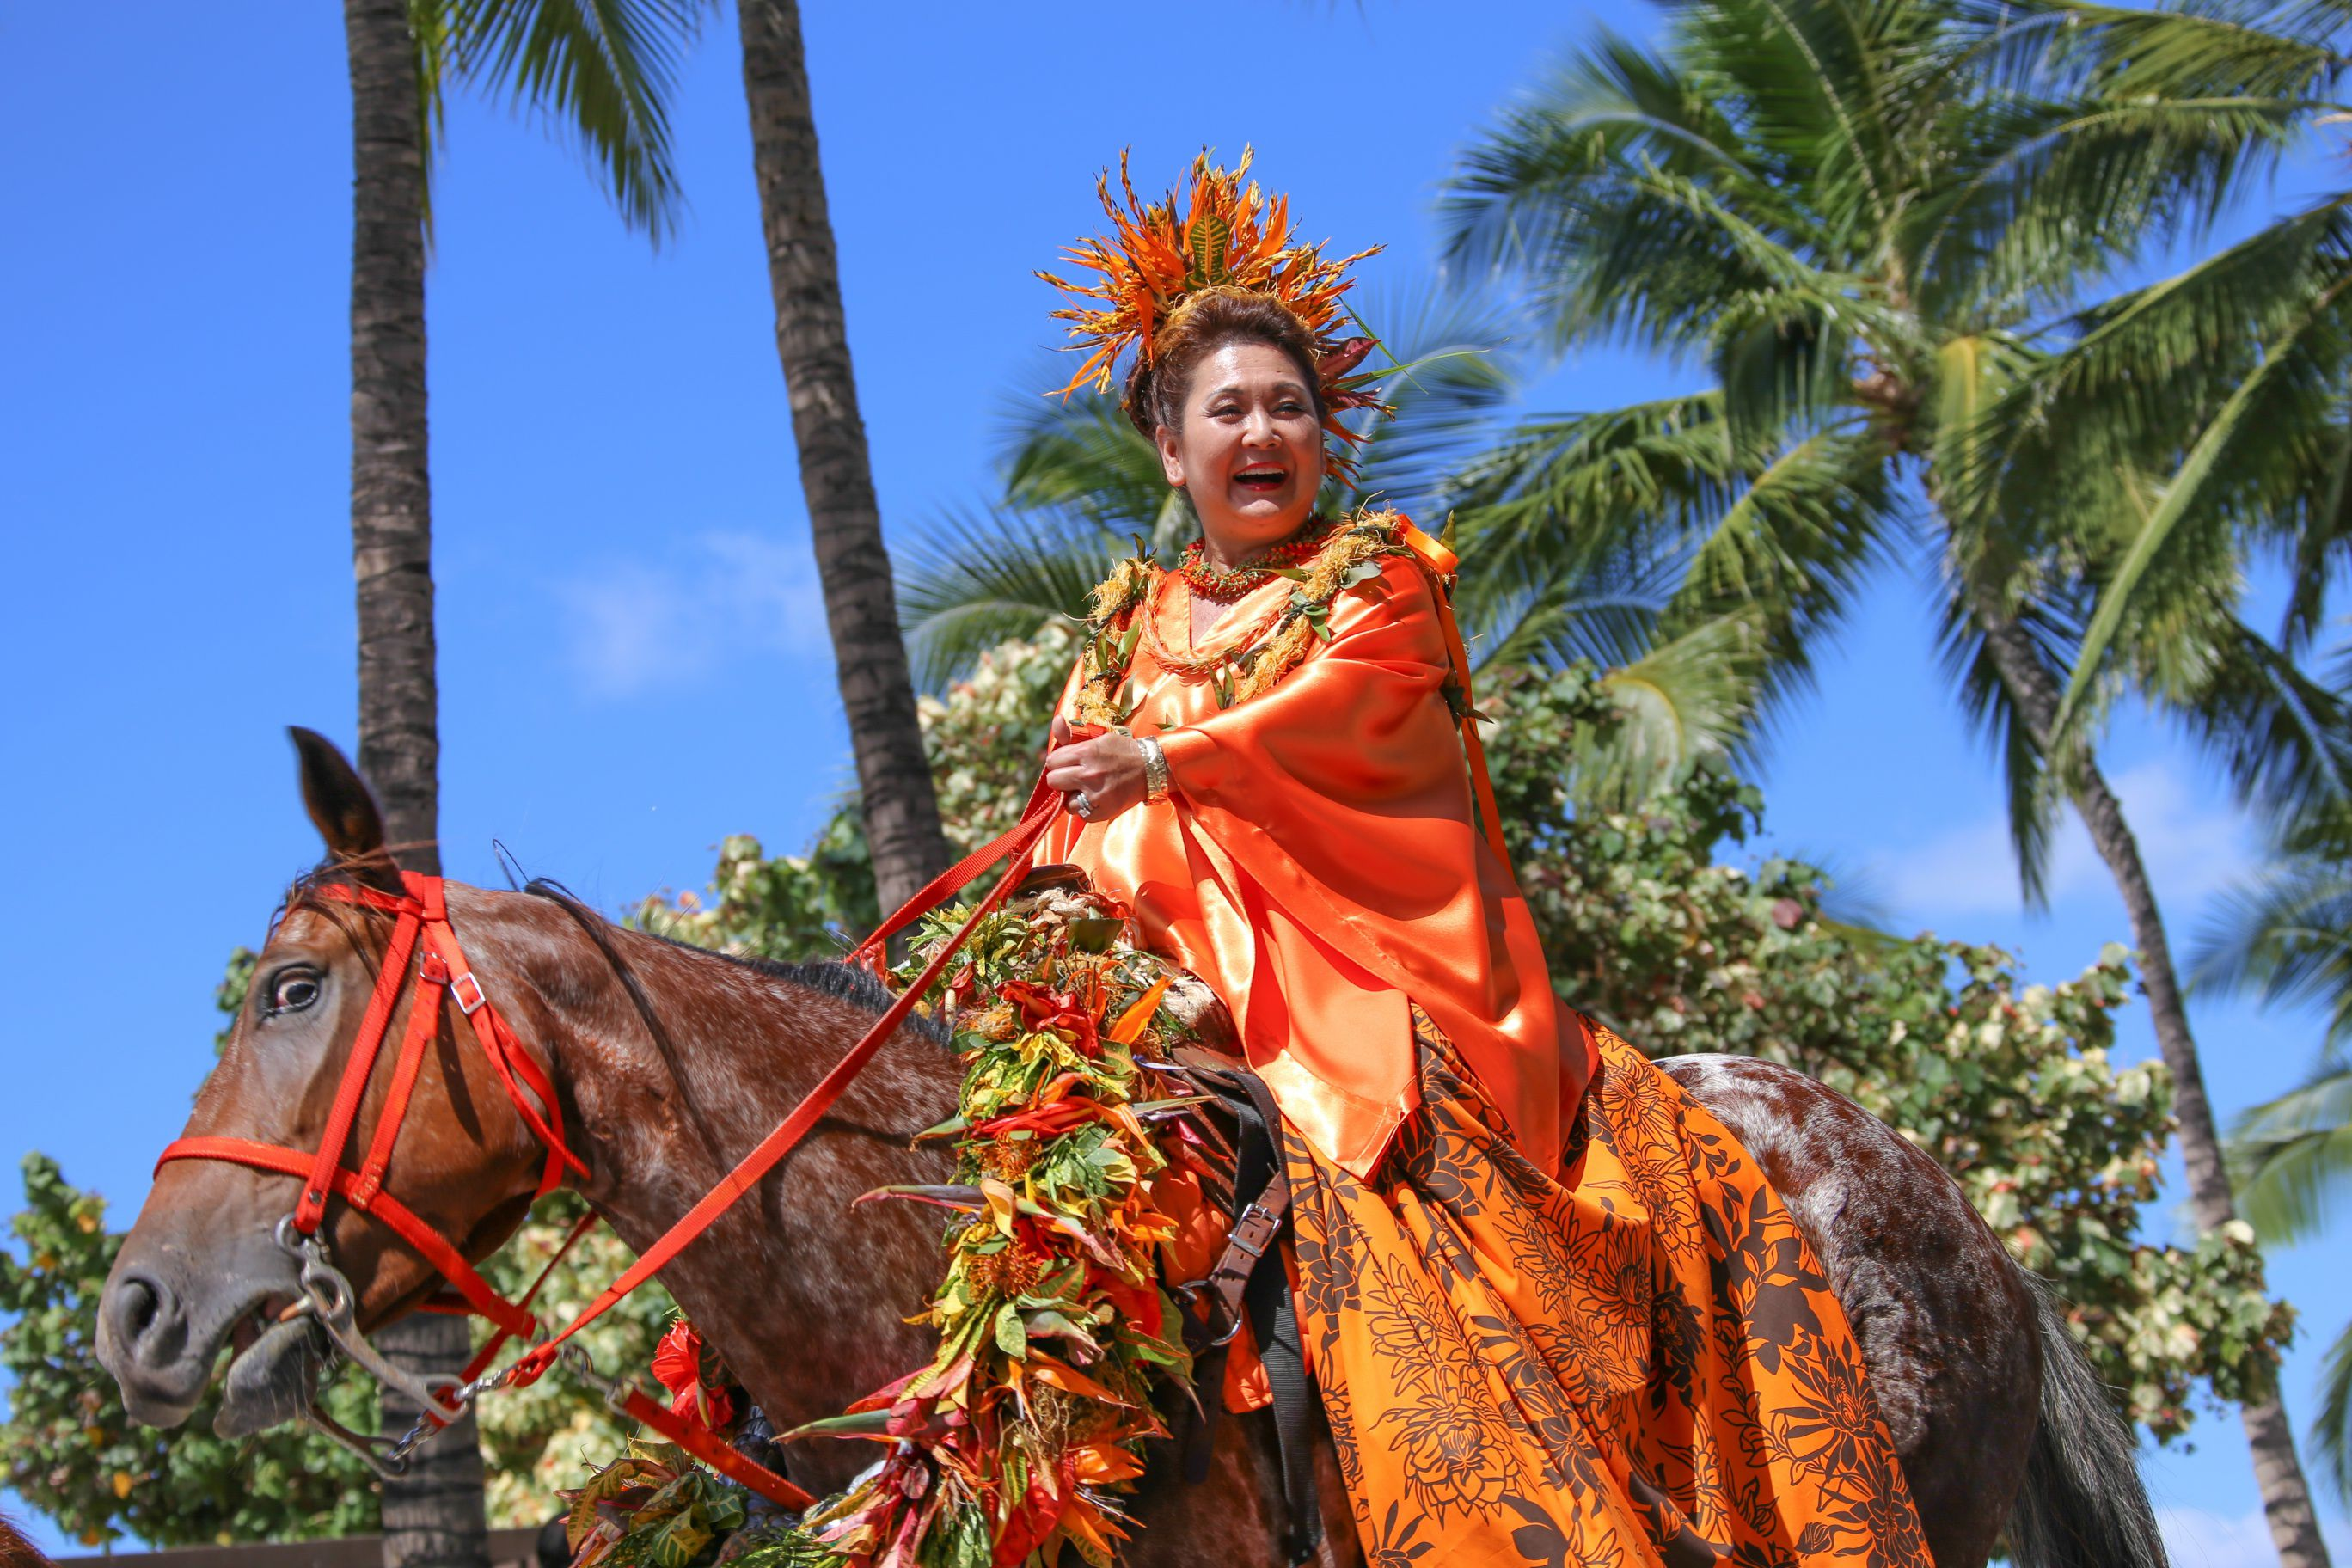 Princess of the Island of Lanai